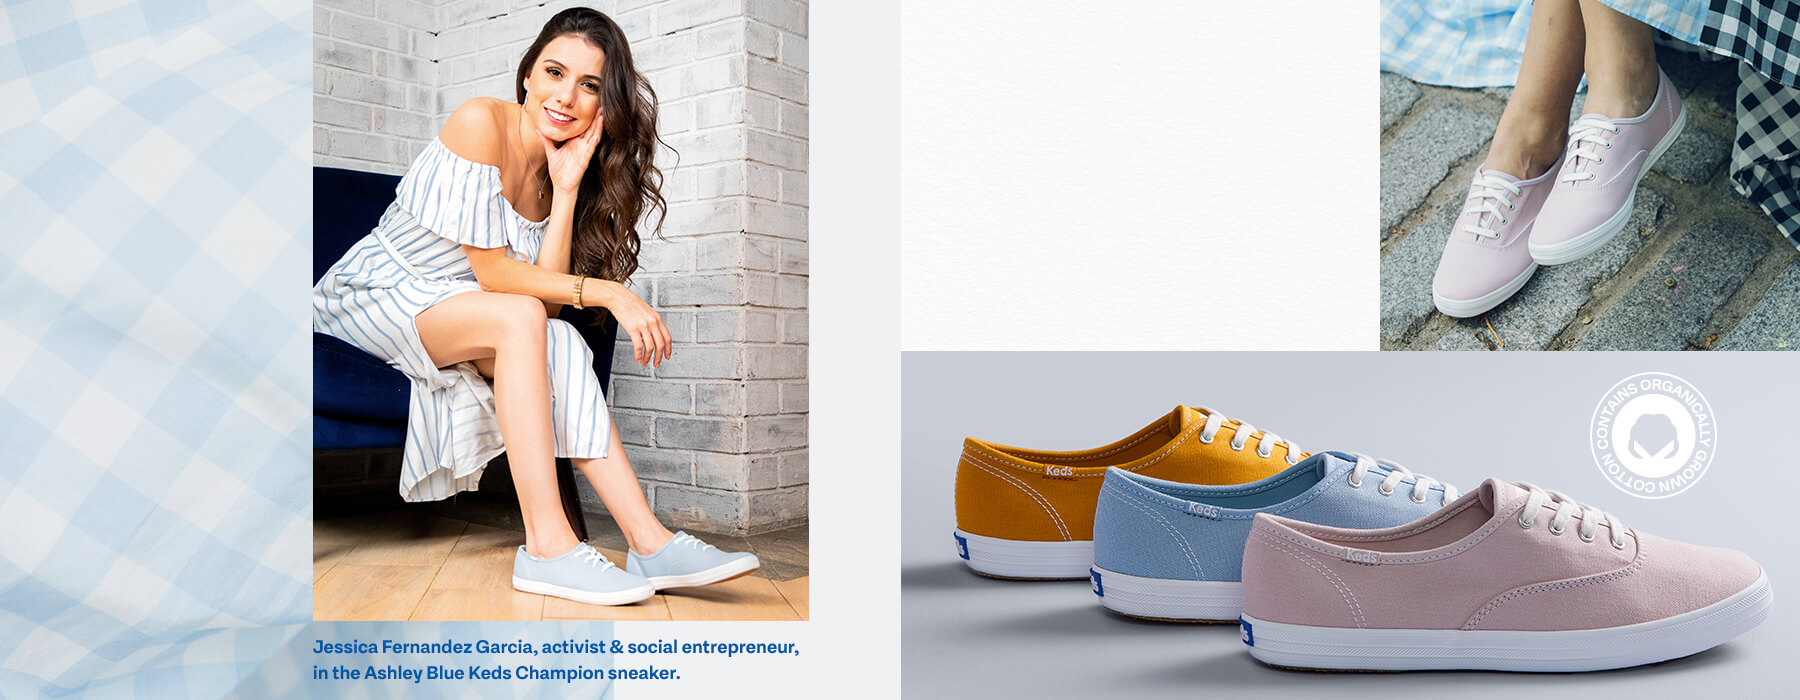 Jessica Fernandez Garcia, activist & social entrepreneur, in the Ashley Blue Keds Champion sneaker.